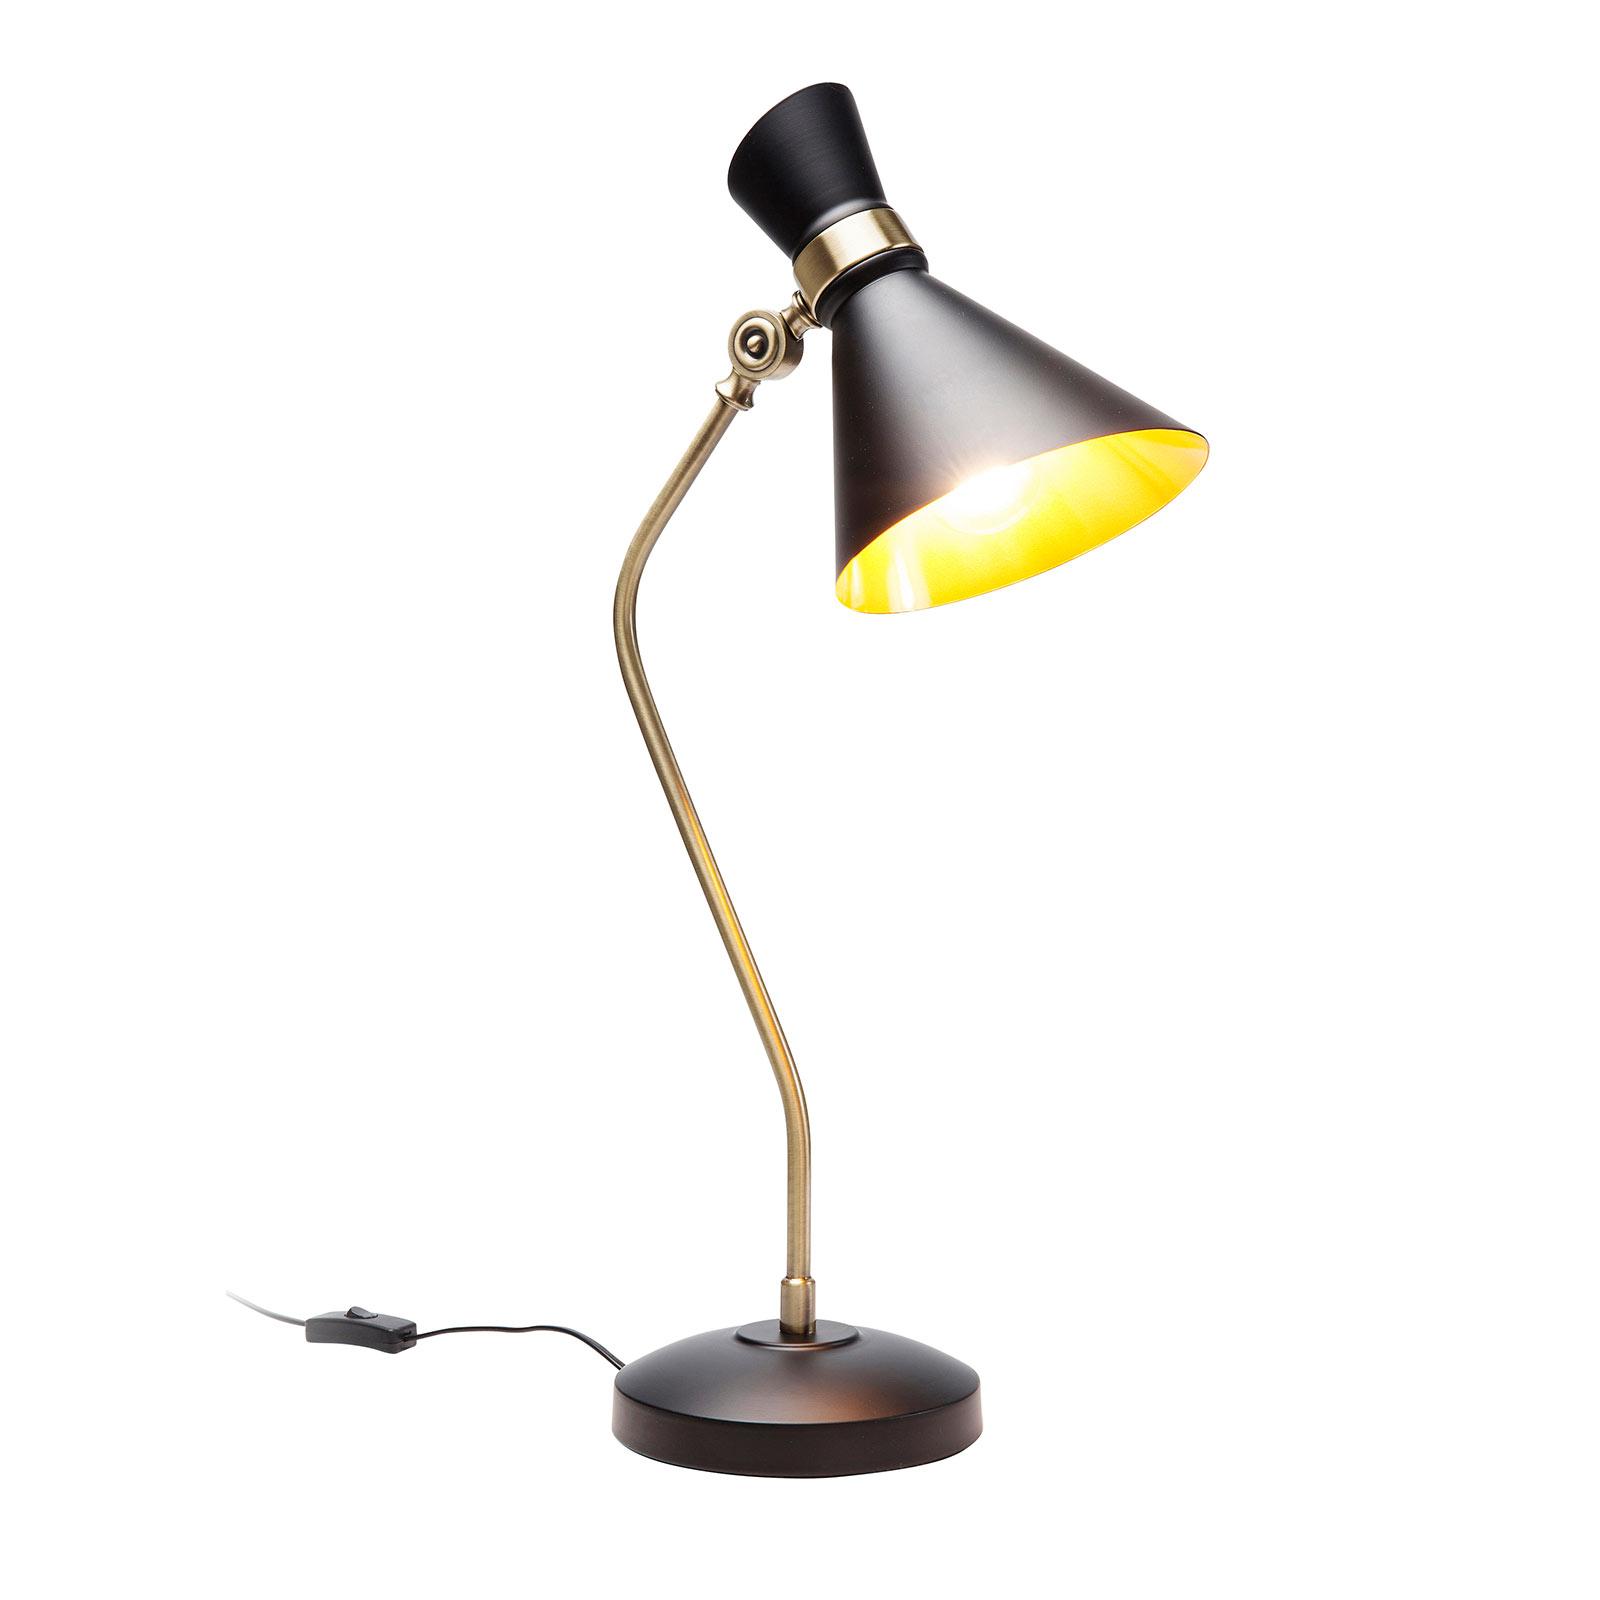 KARE Skagen tafellamp in zwart/goud-design